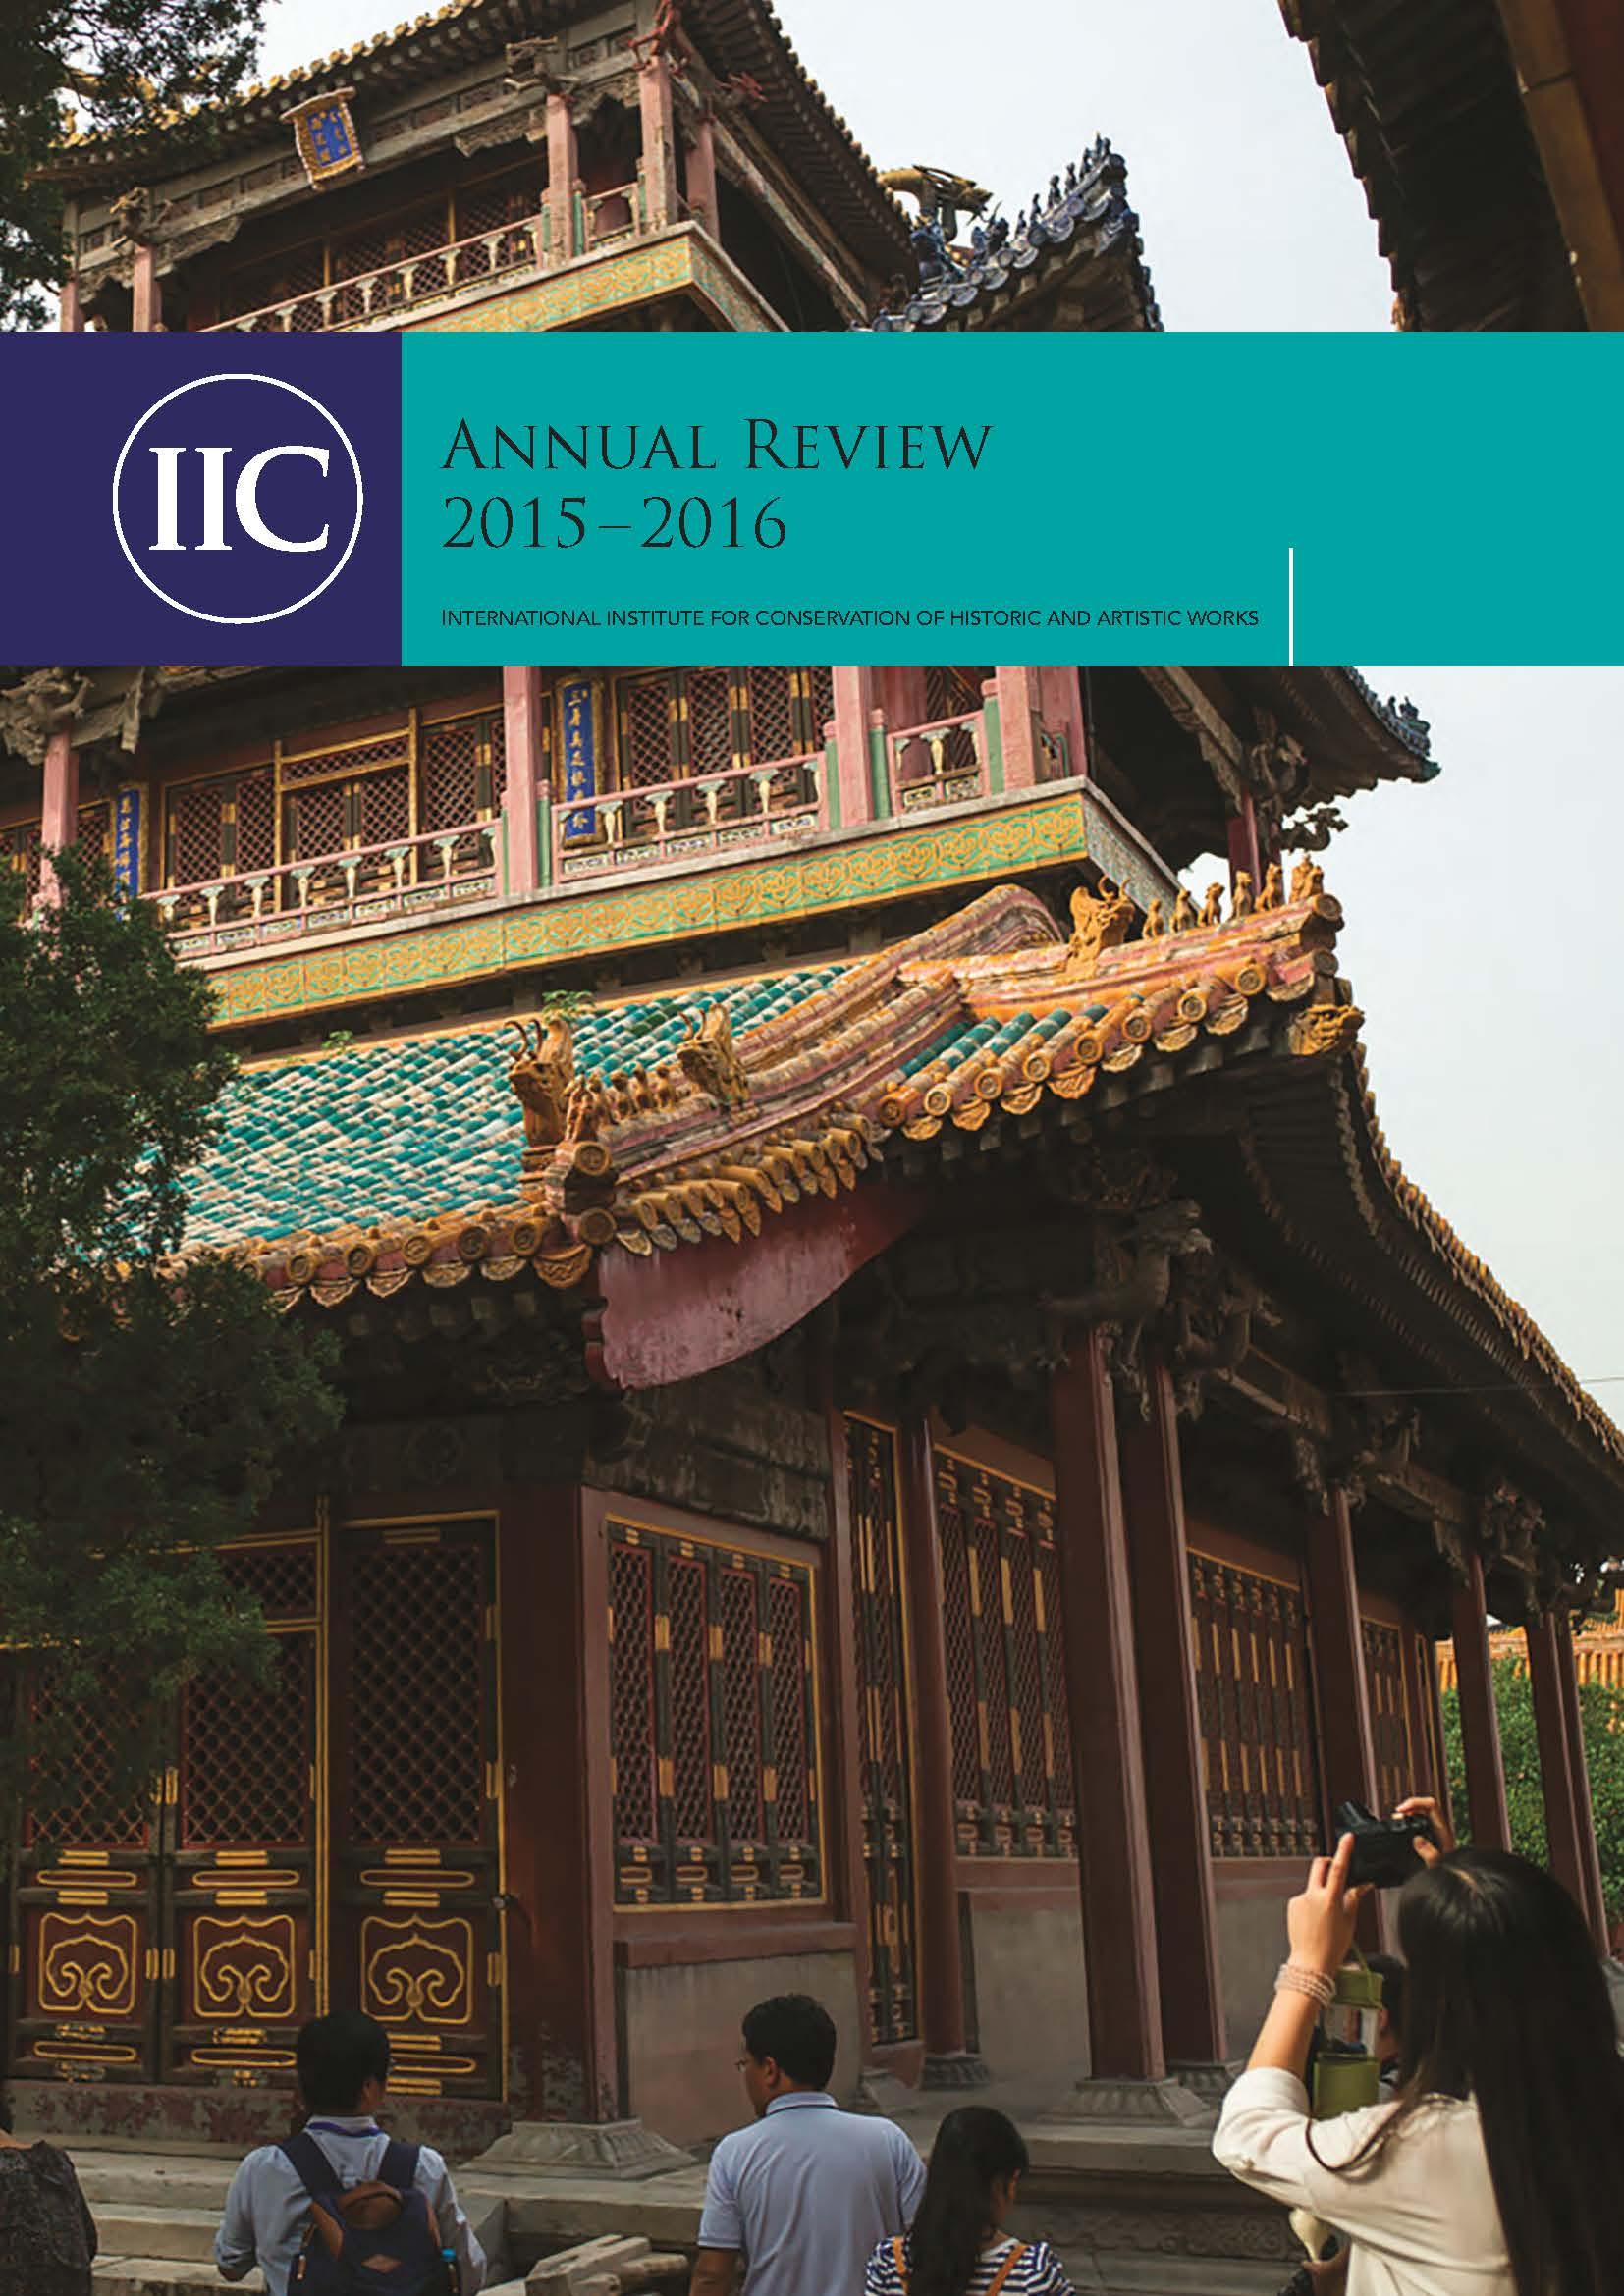 IIC Annual Report 2015 - 2016